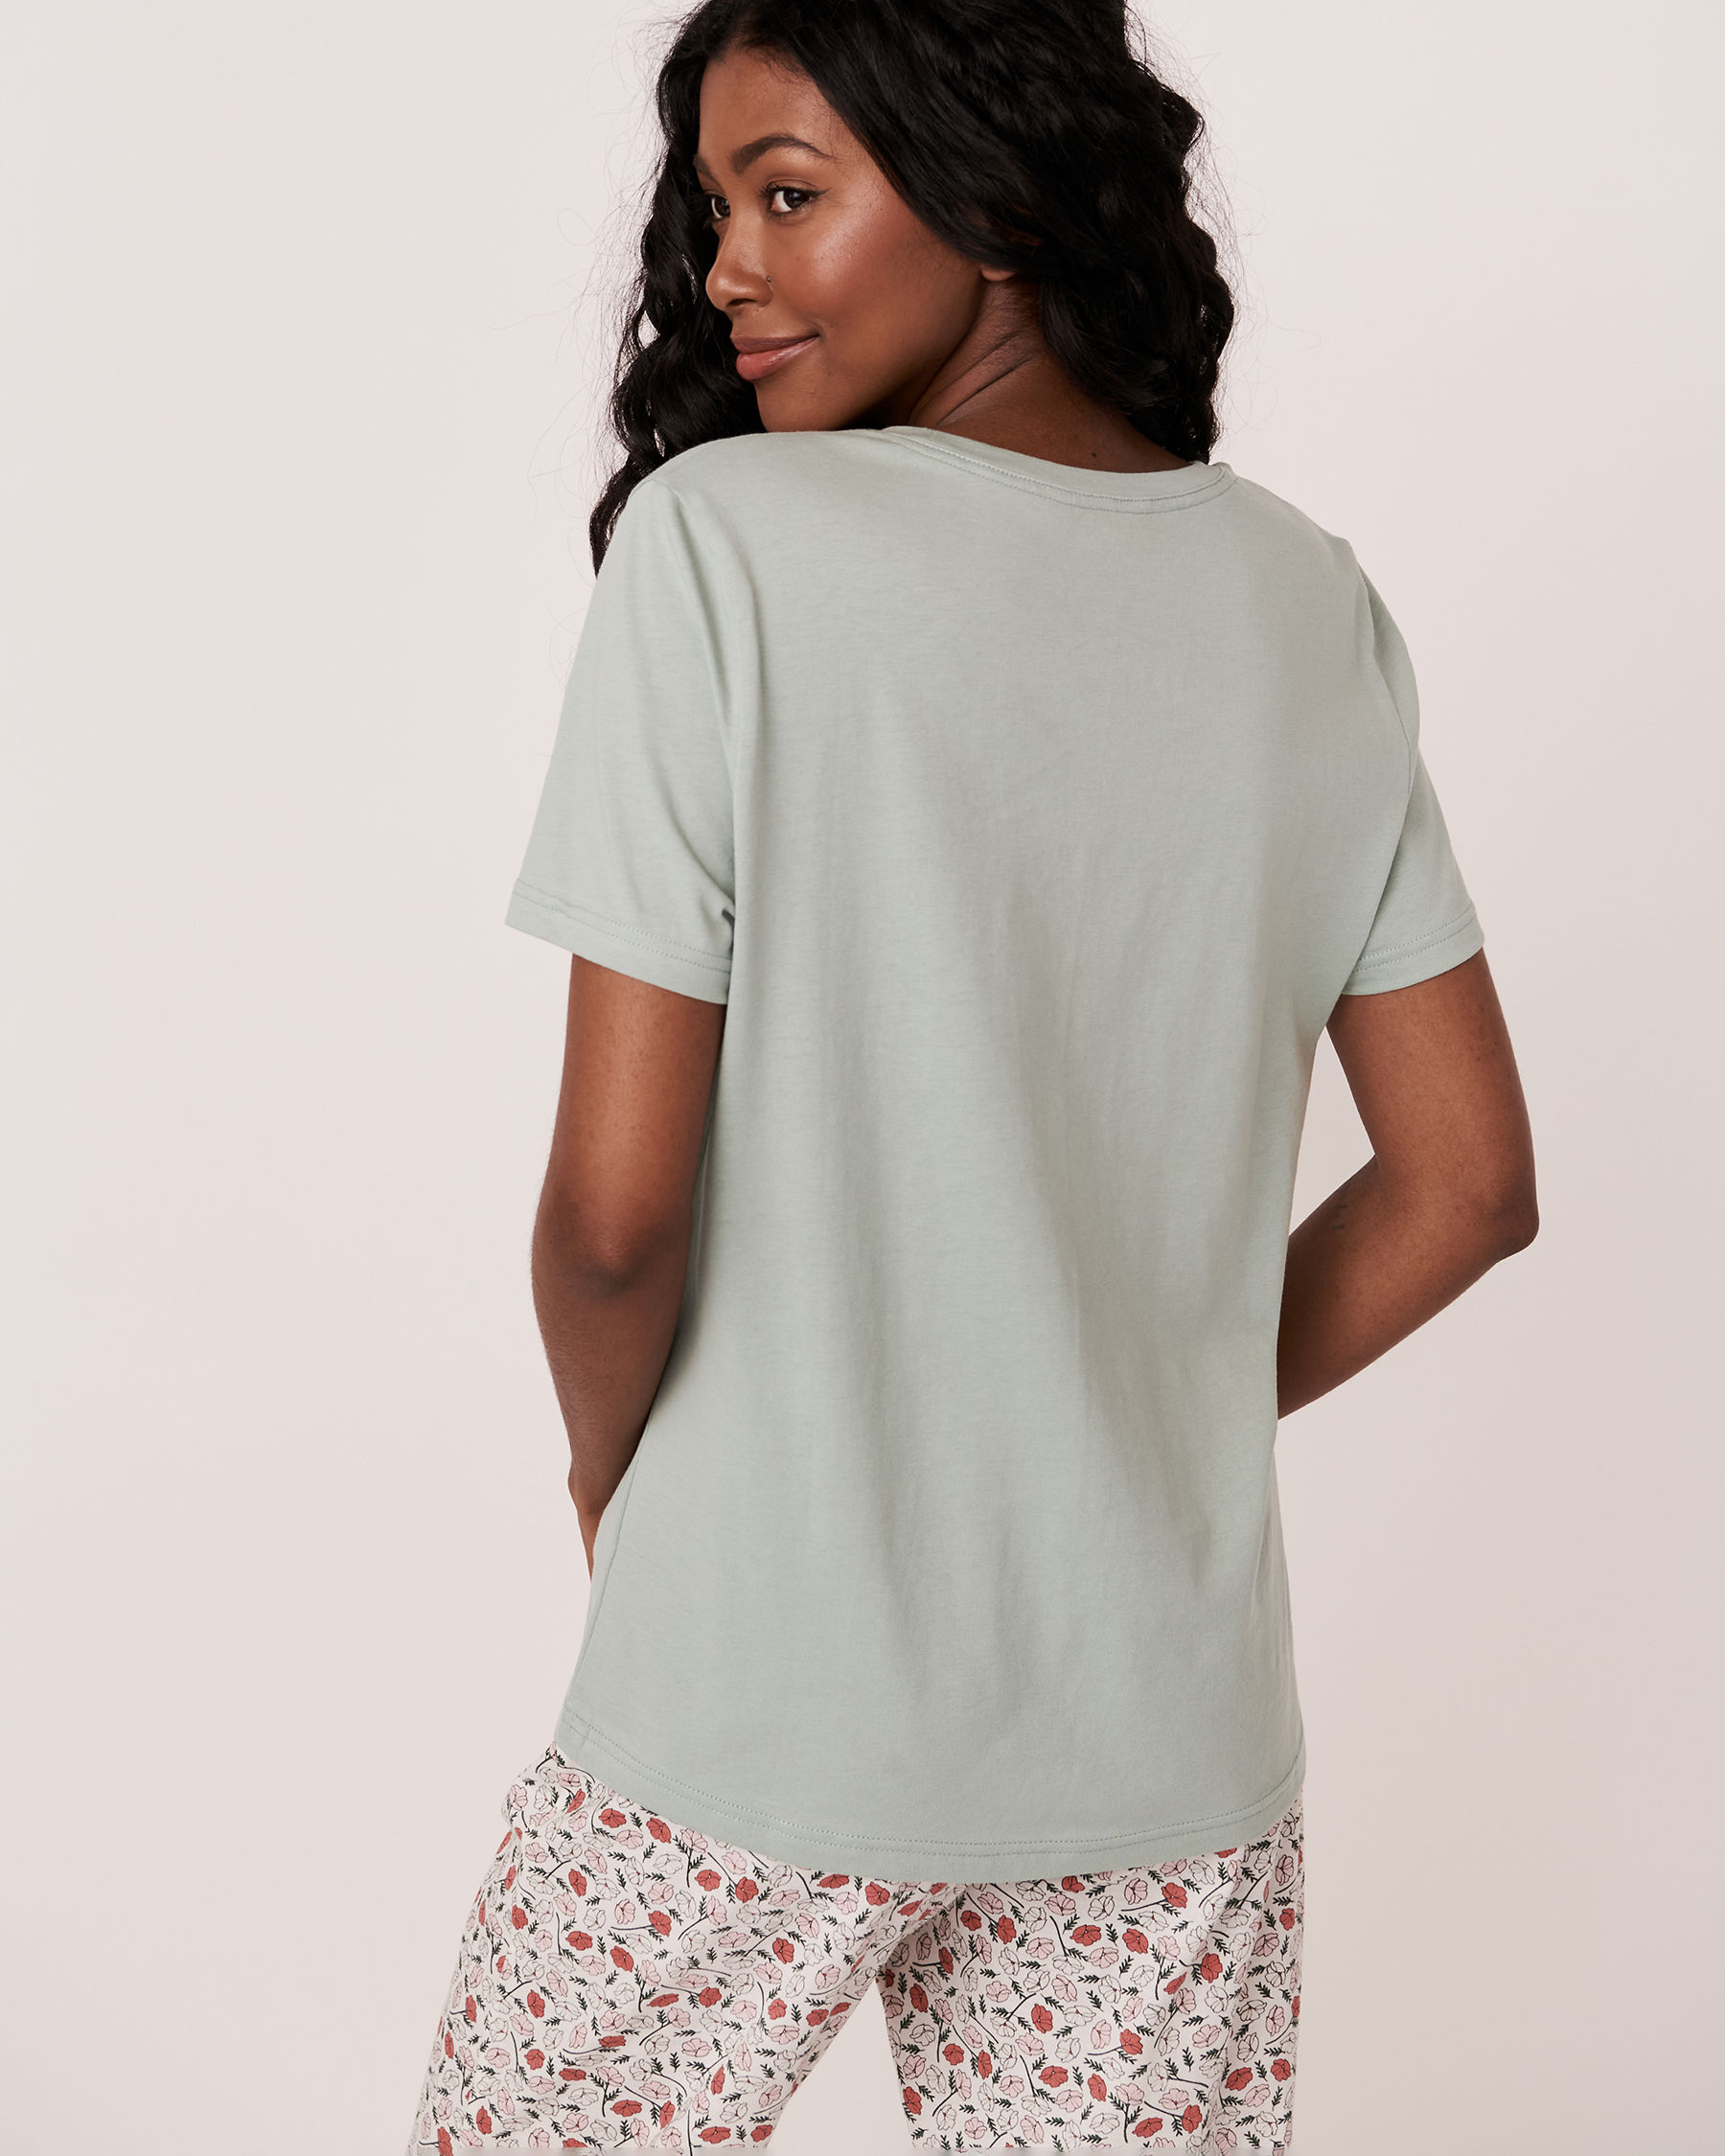 LA VIE EN ROSE V-neckline T-shirt Green 40100123 - View3